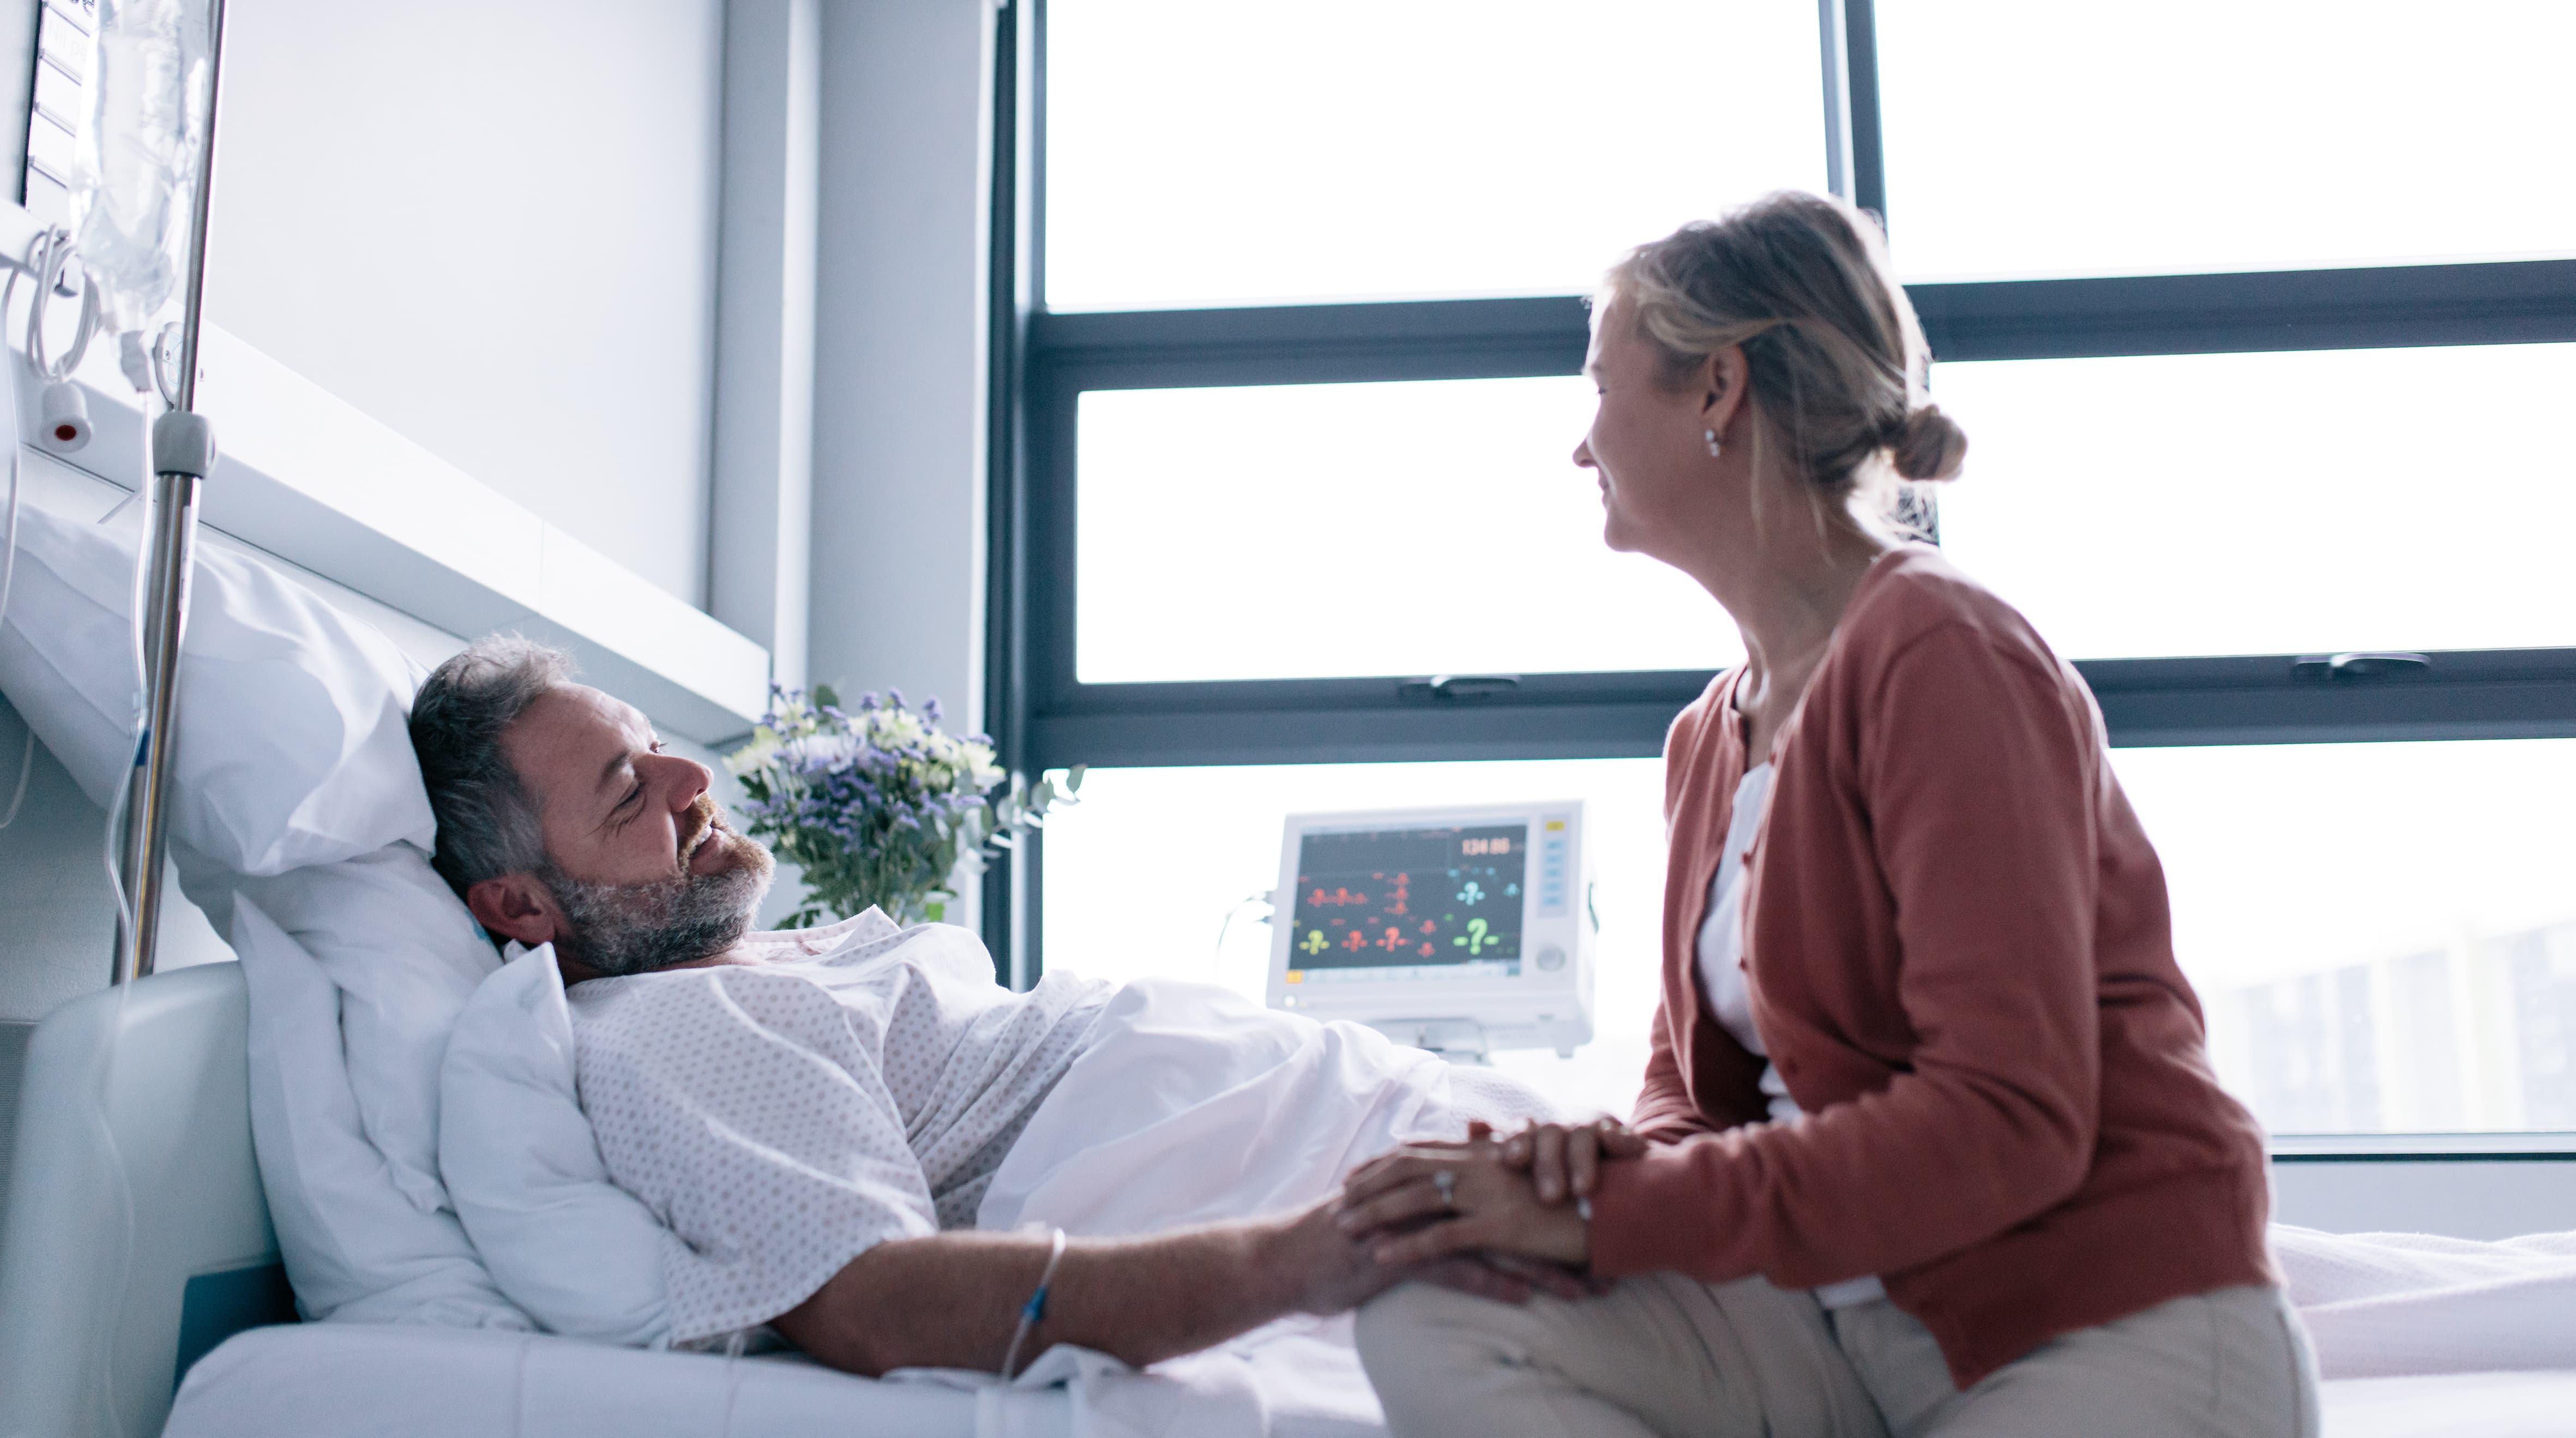 Frau besucht Mann am Krankenbett